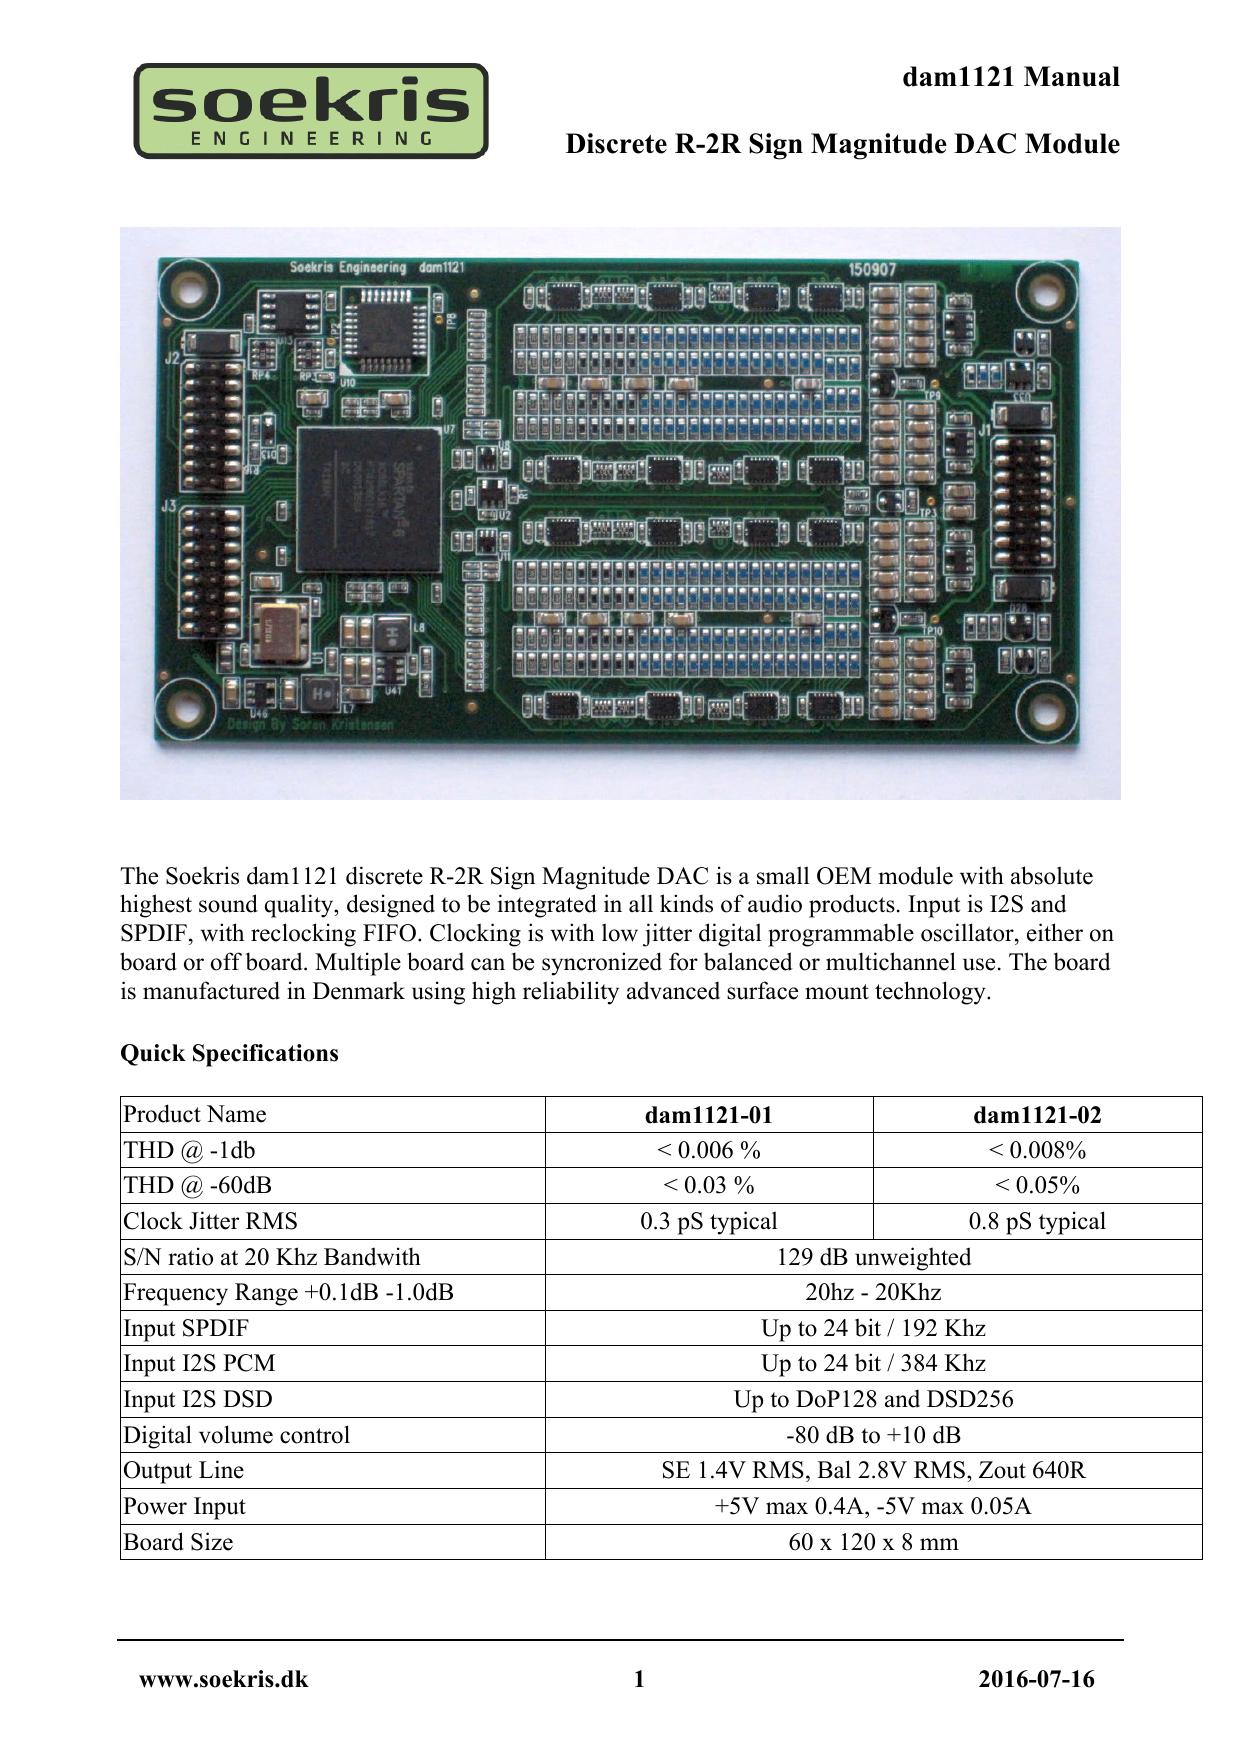 dam1121 Manual Discrete R-2R Sign Magnitude DAC Module